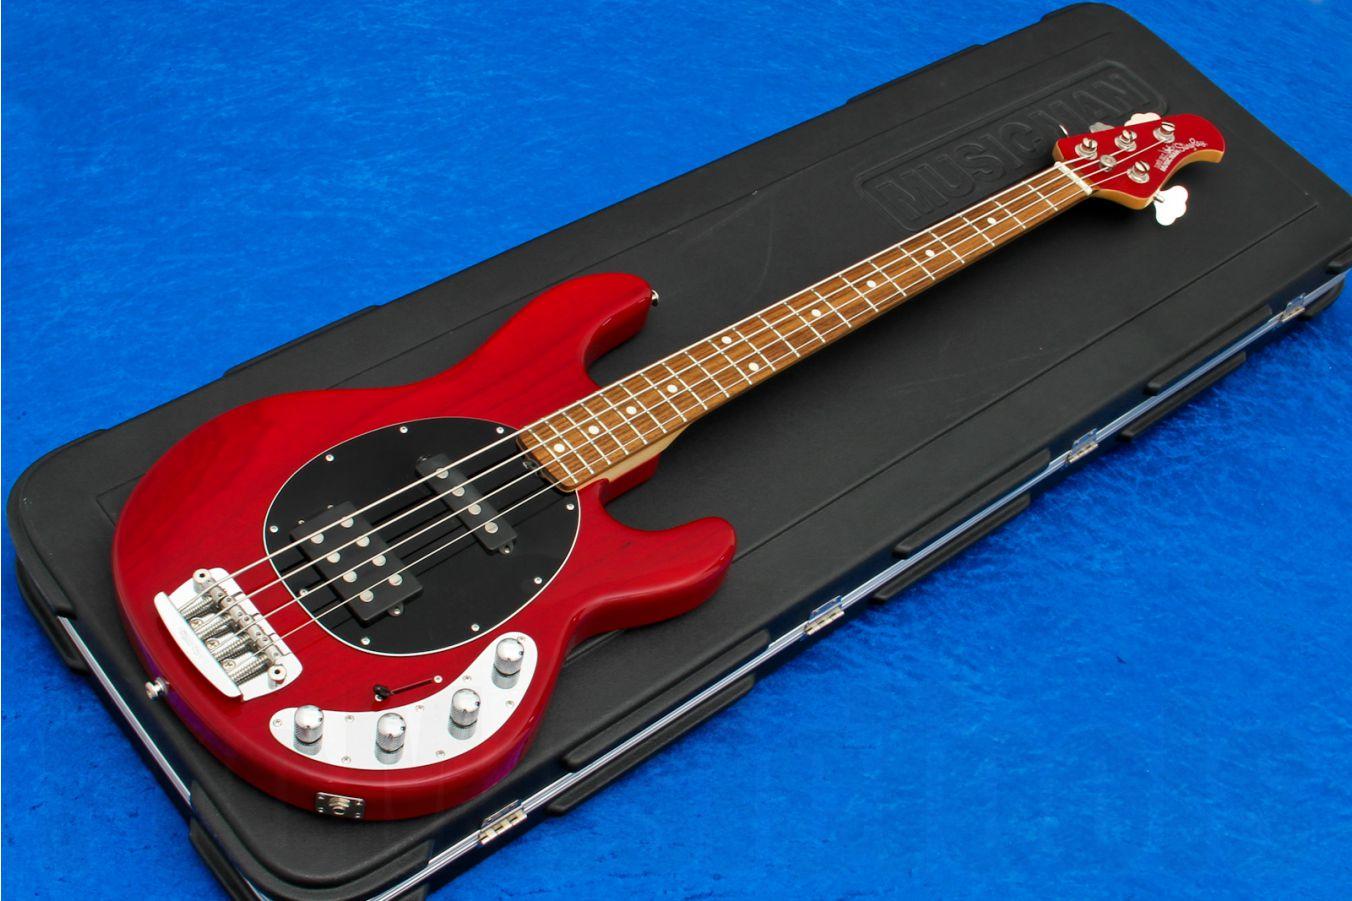 Music Man USA Stingray 4 HS TR - Translucent Red RW MH